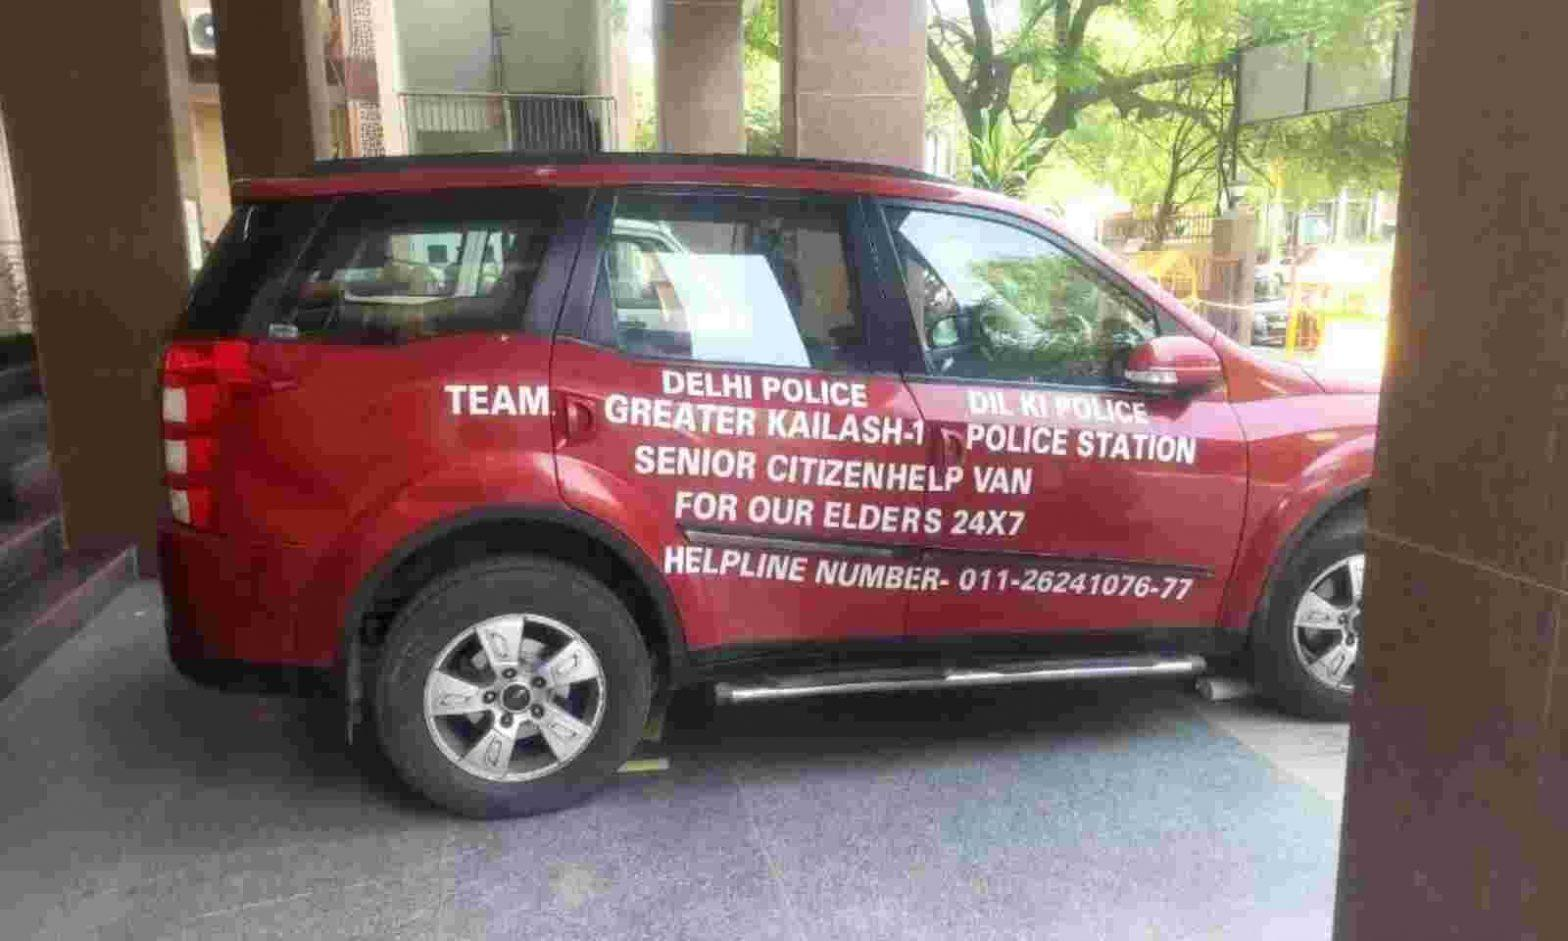 Delhi Police launched vehicle helpline 'COVI Van' for senior citizens|প্রবীণ নাগরিকদের জন্য যানবাহন হেল্পলাইন,'কোভি ভ্যান' চালু করেছে দিল্লি পুলিশ_40.1